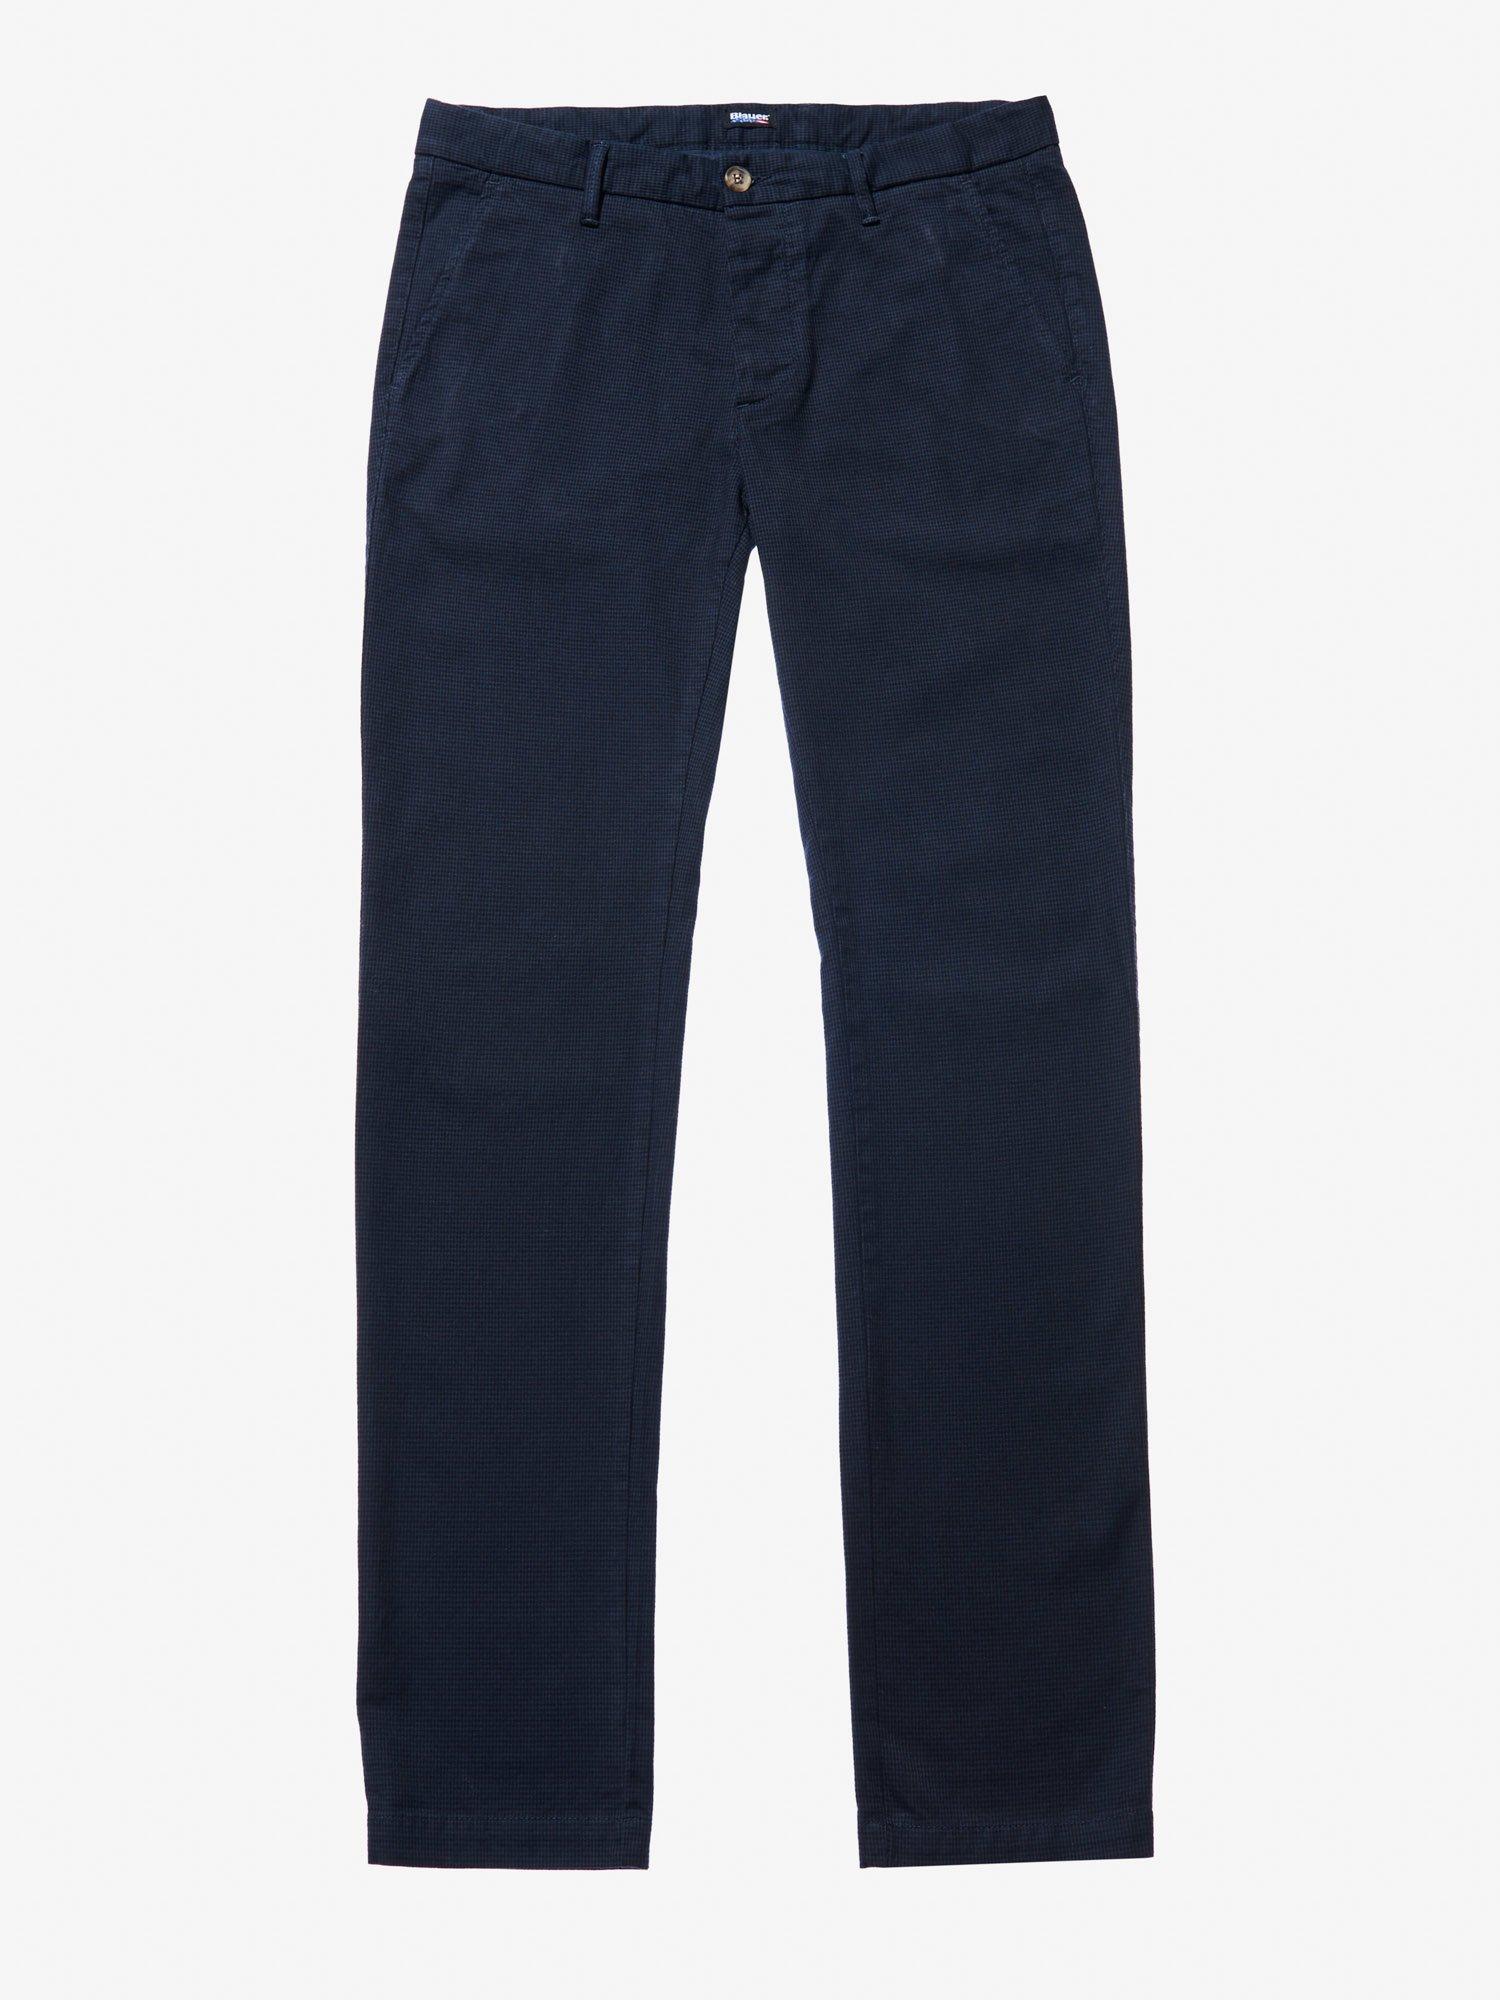 Blauer - HOUNDSTOOTH GABARDINE PANTS - Blue Sapphire - Blauer